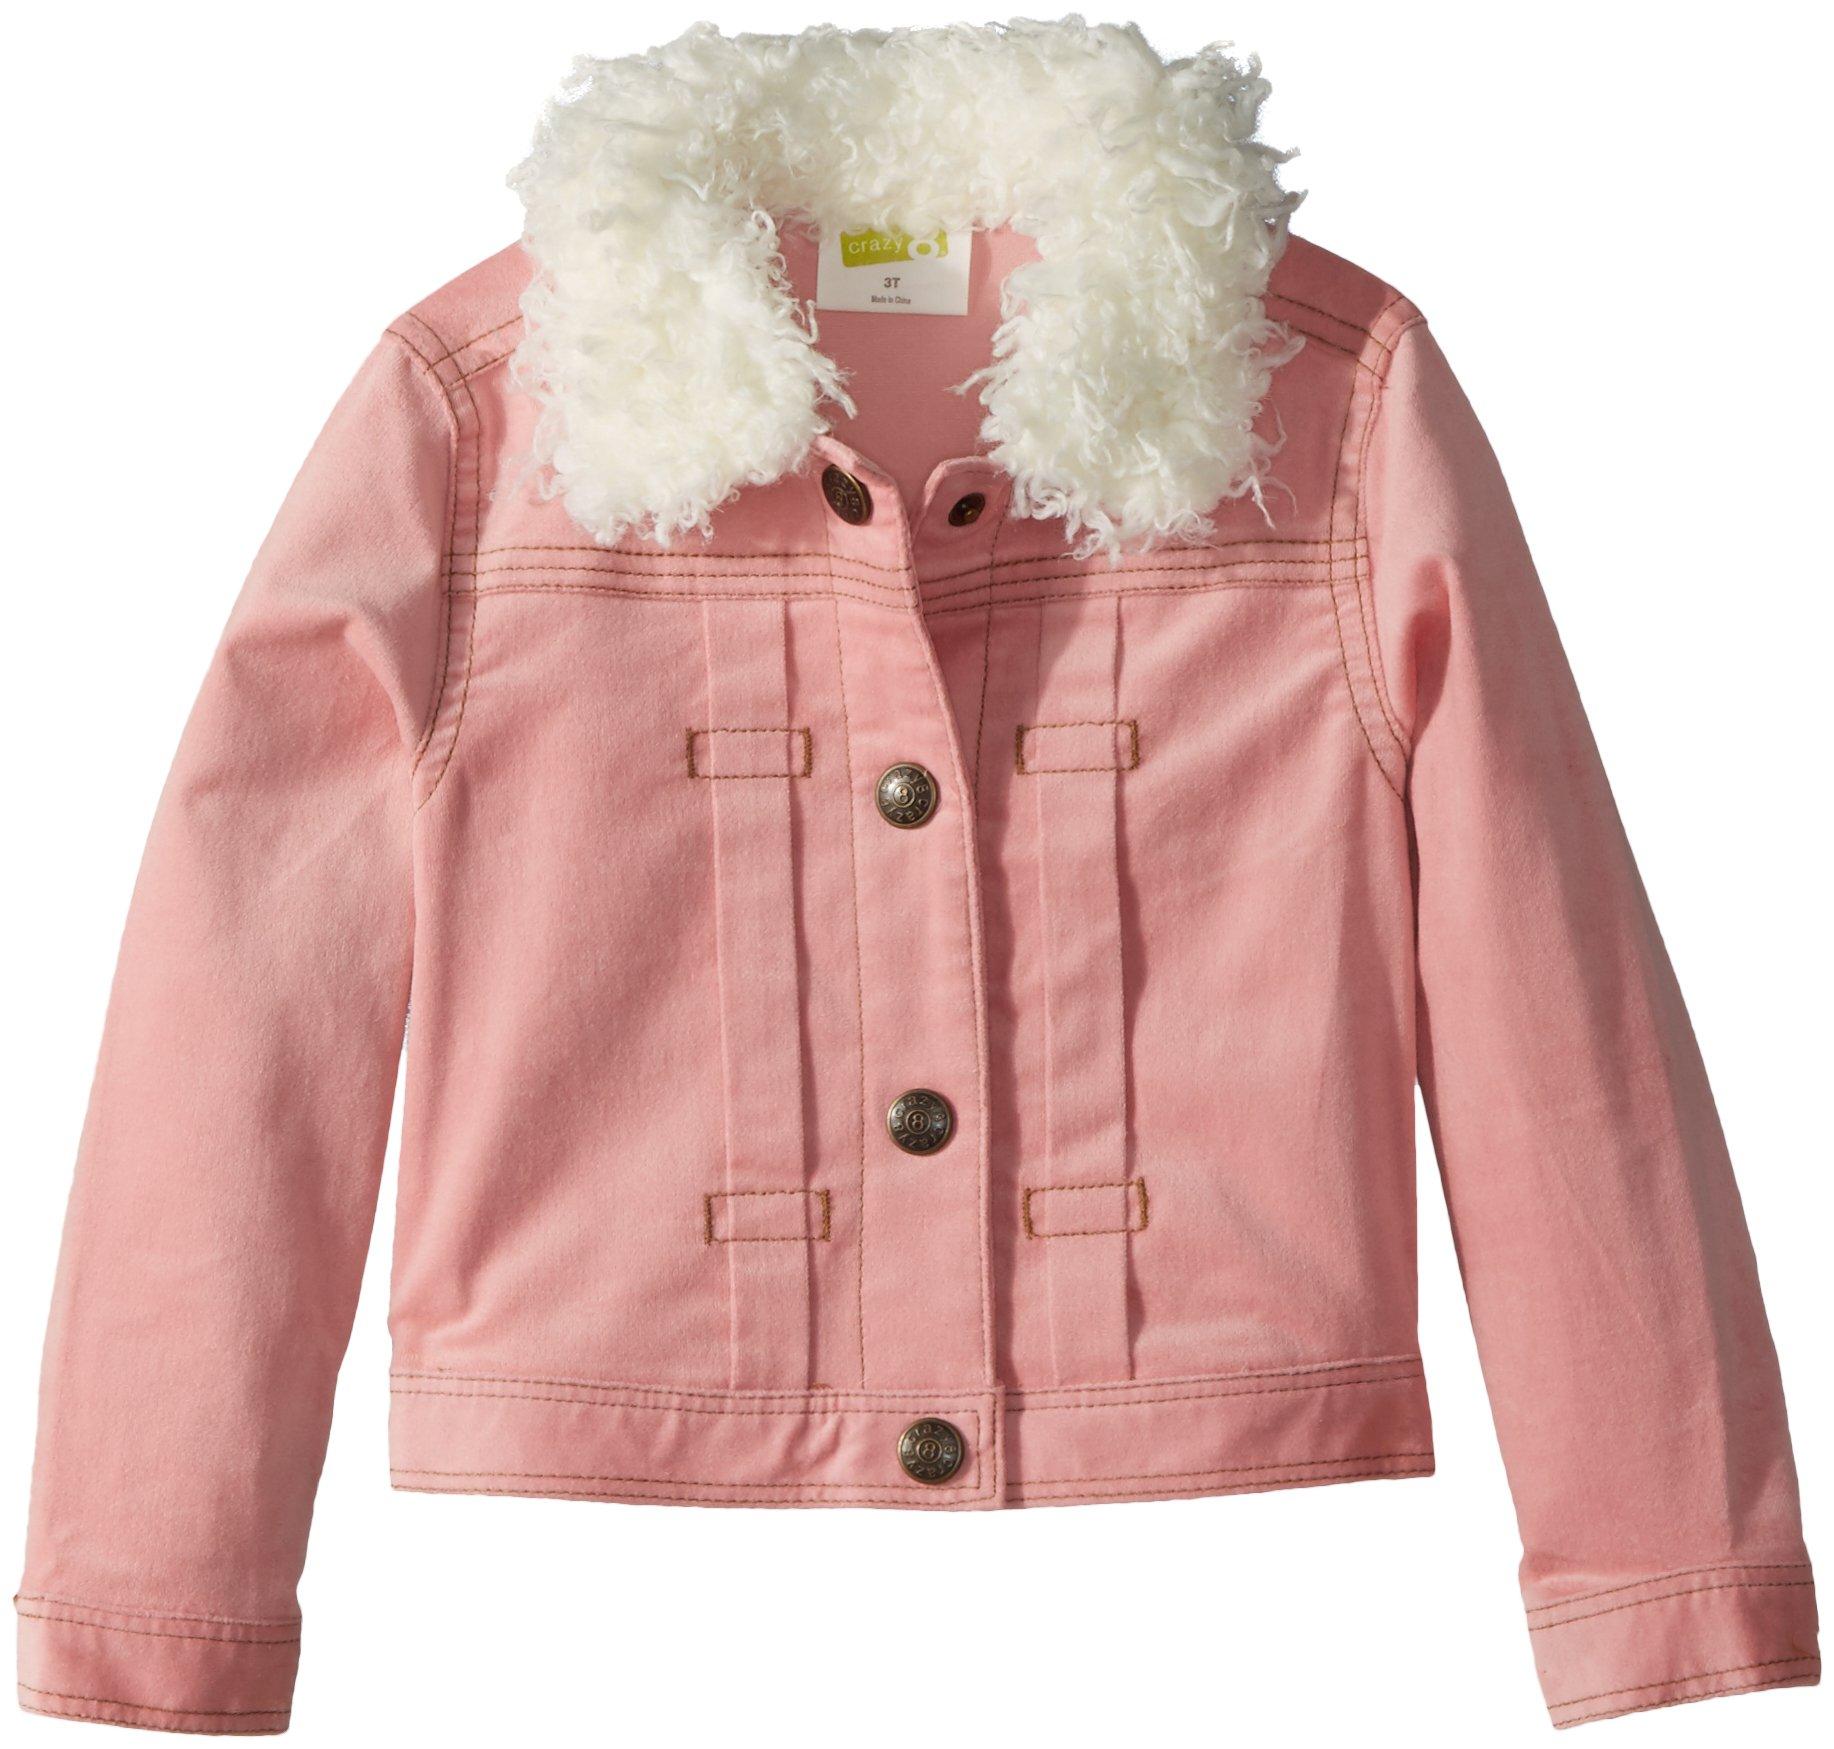 Crazy 8 Toddler Girls' Sherpa Lined Cordorouy Jacket, Blush, 12-18 Mo